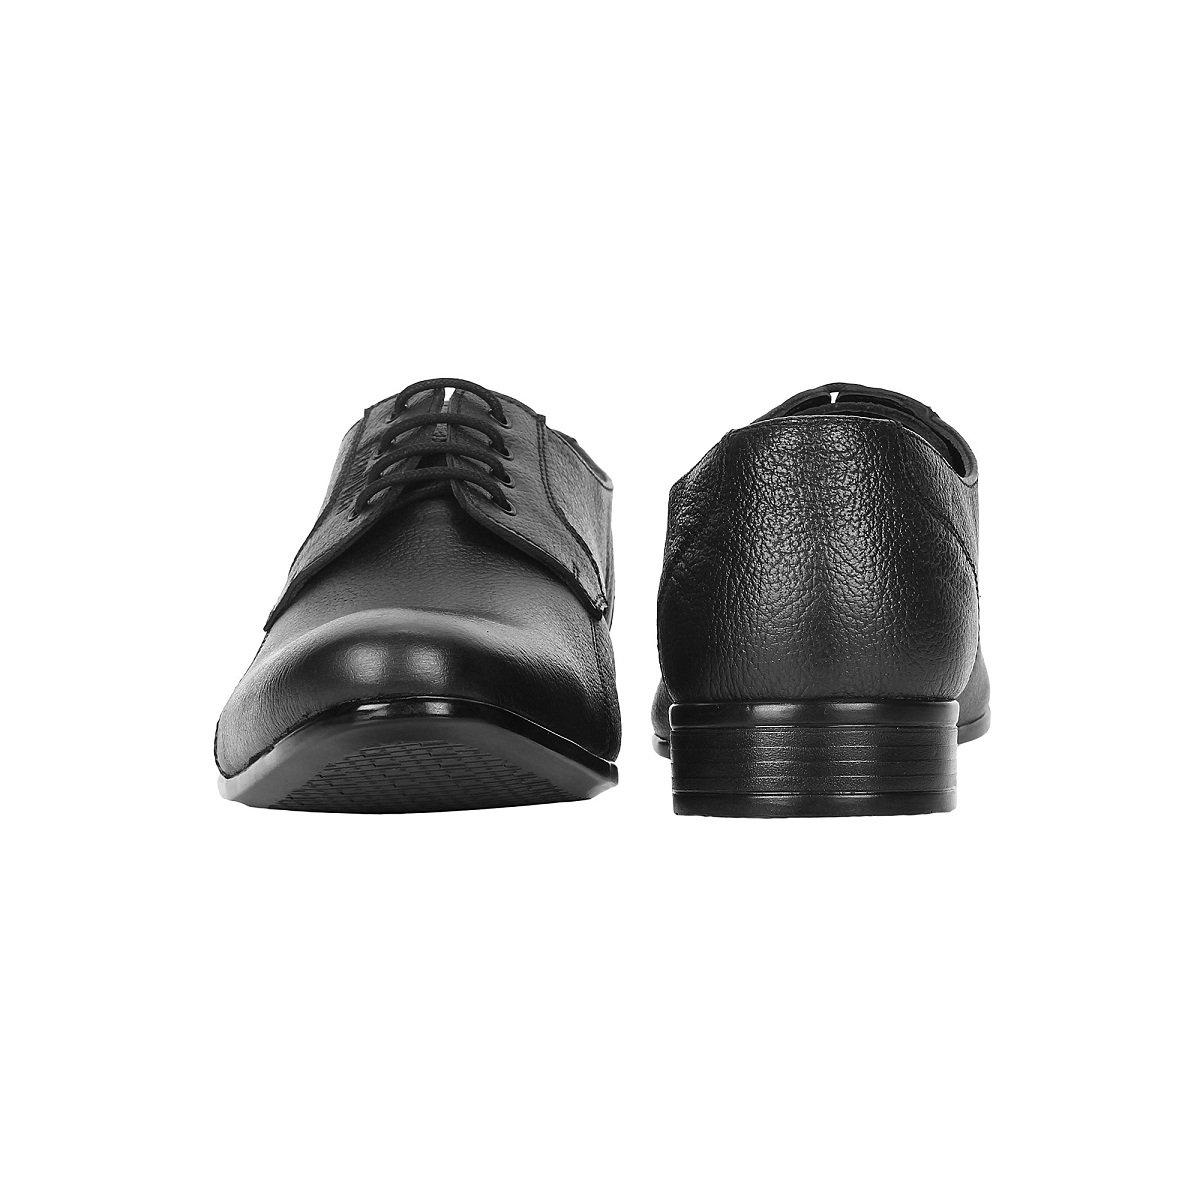 Seeandwear Men's Formal Shoes- Buy